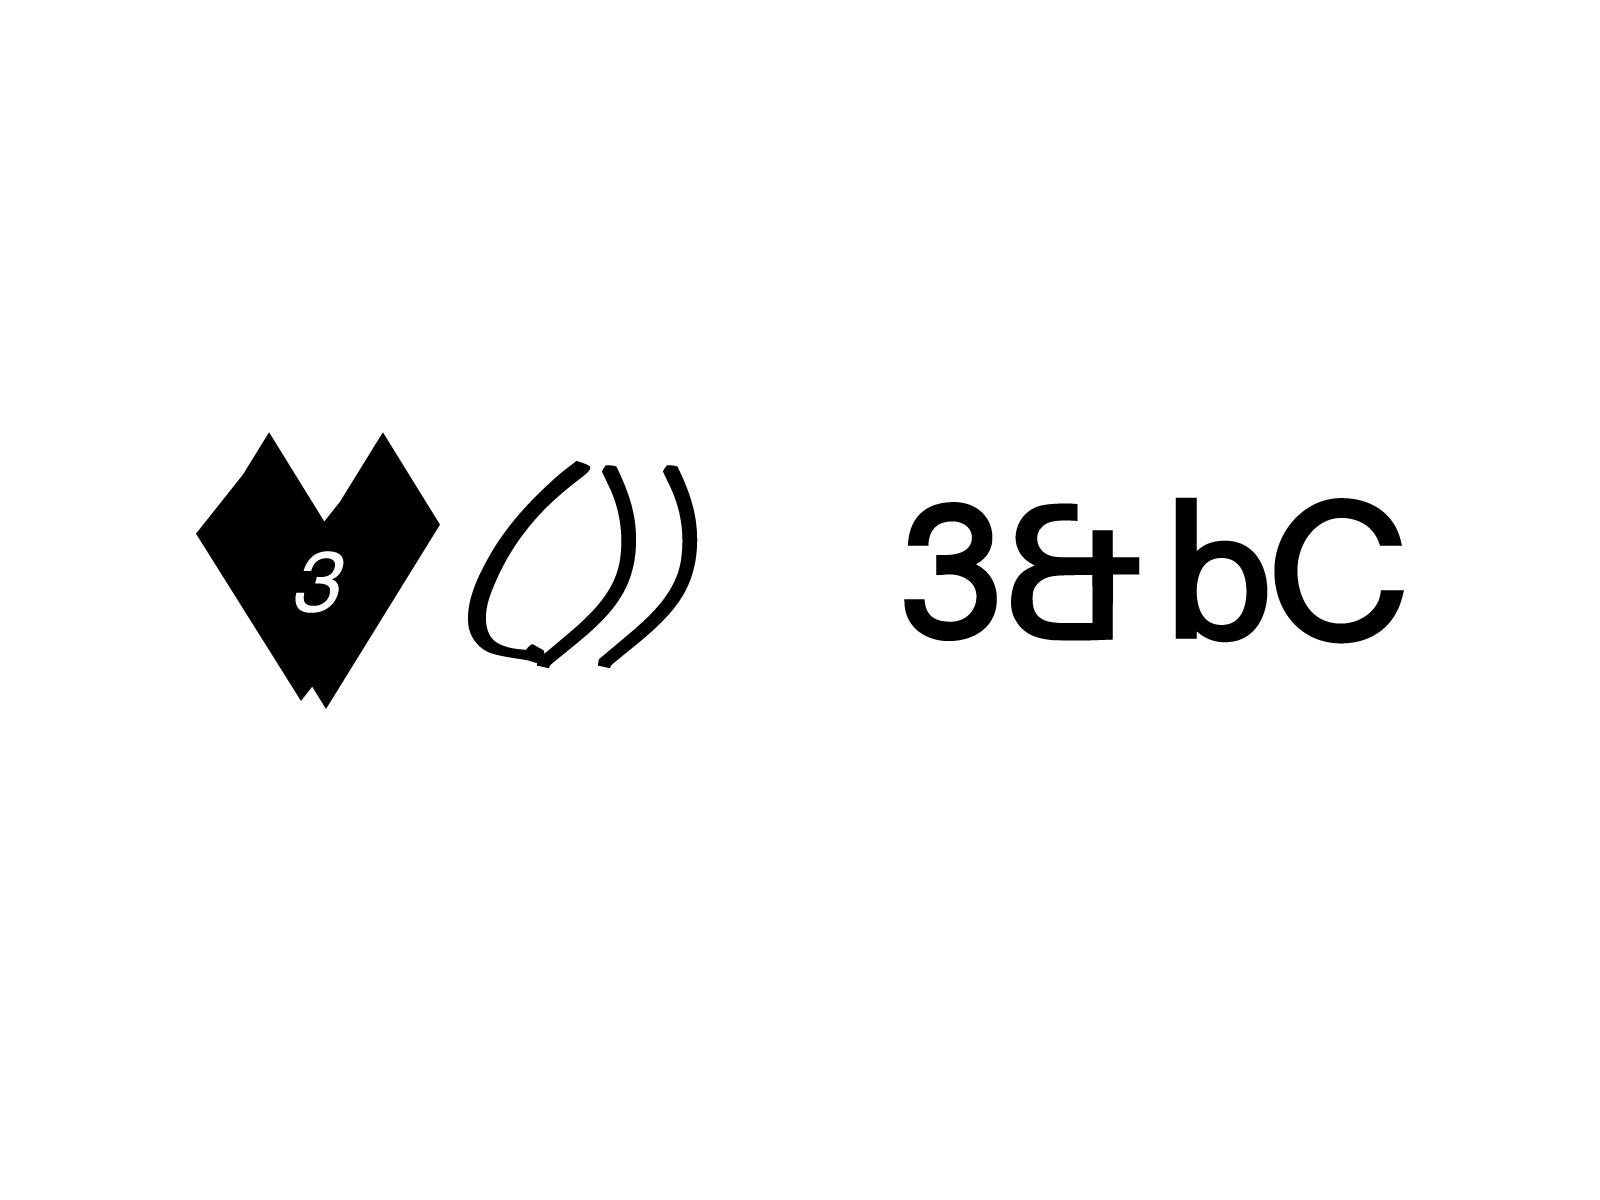 works_3&bC_logo_01